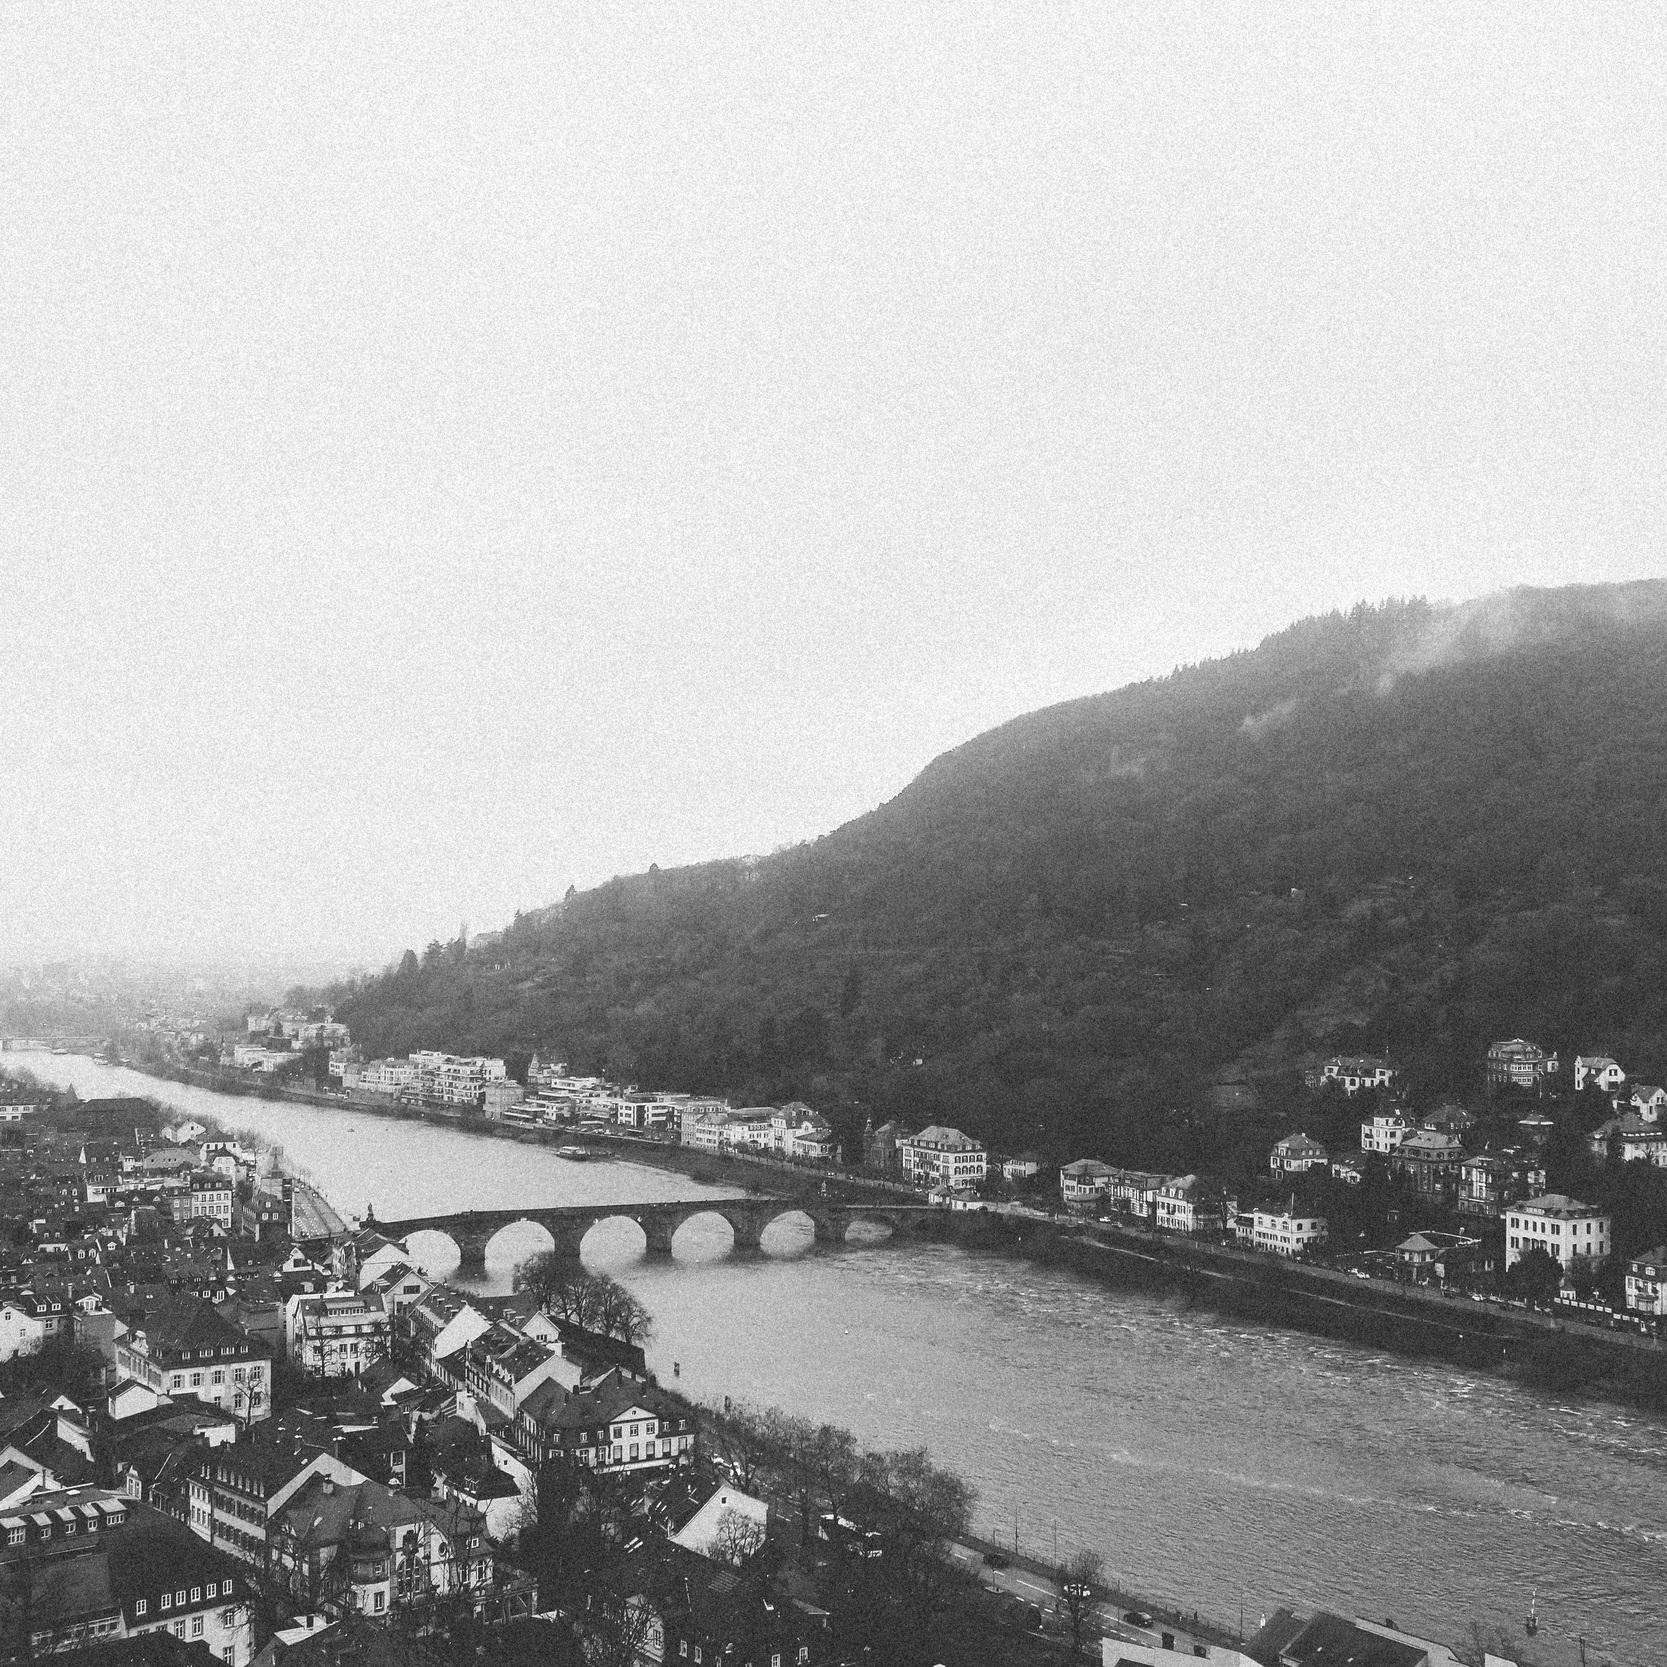 Germany Travel Diary - taylorkristiina.com